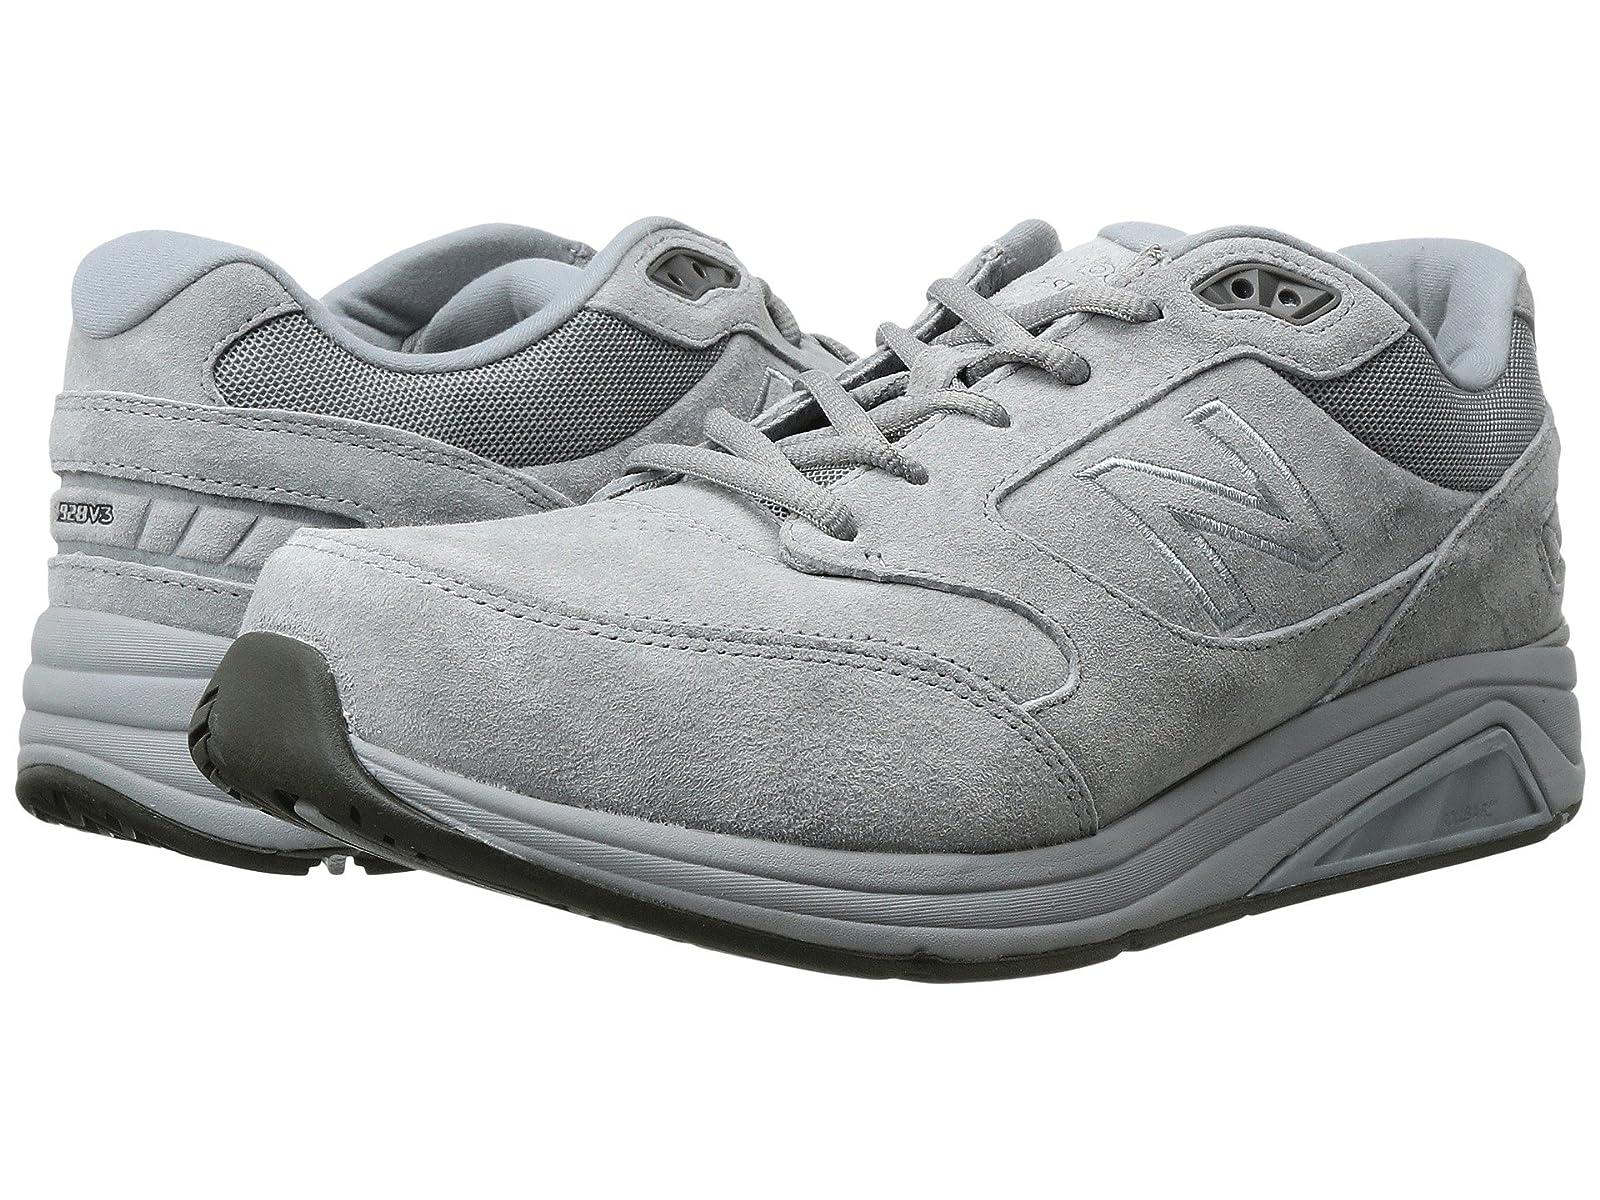 New Balance MW928v3Atmospheric grades have affordable shoes